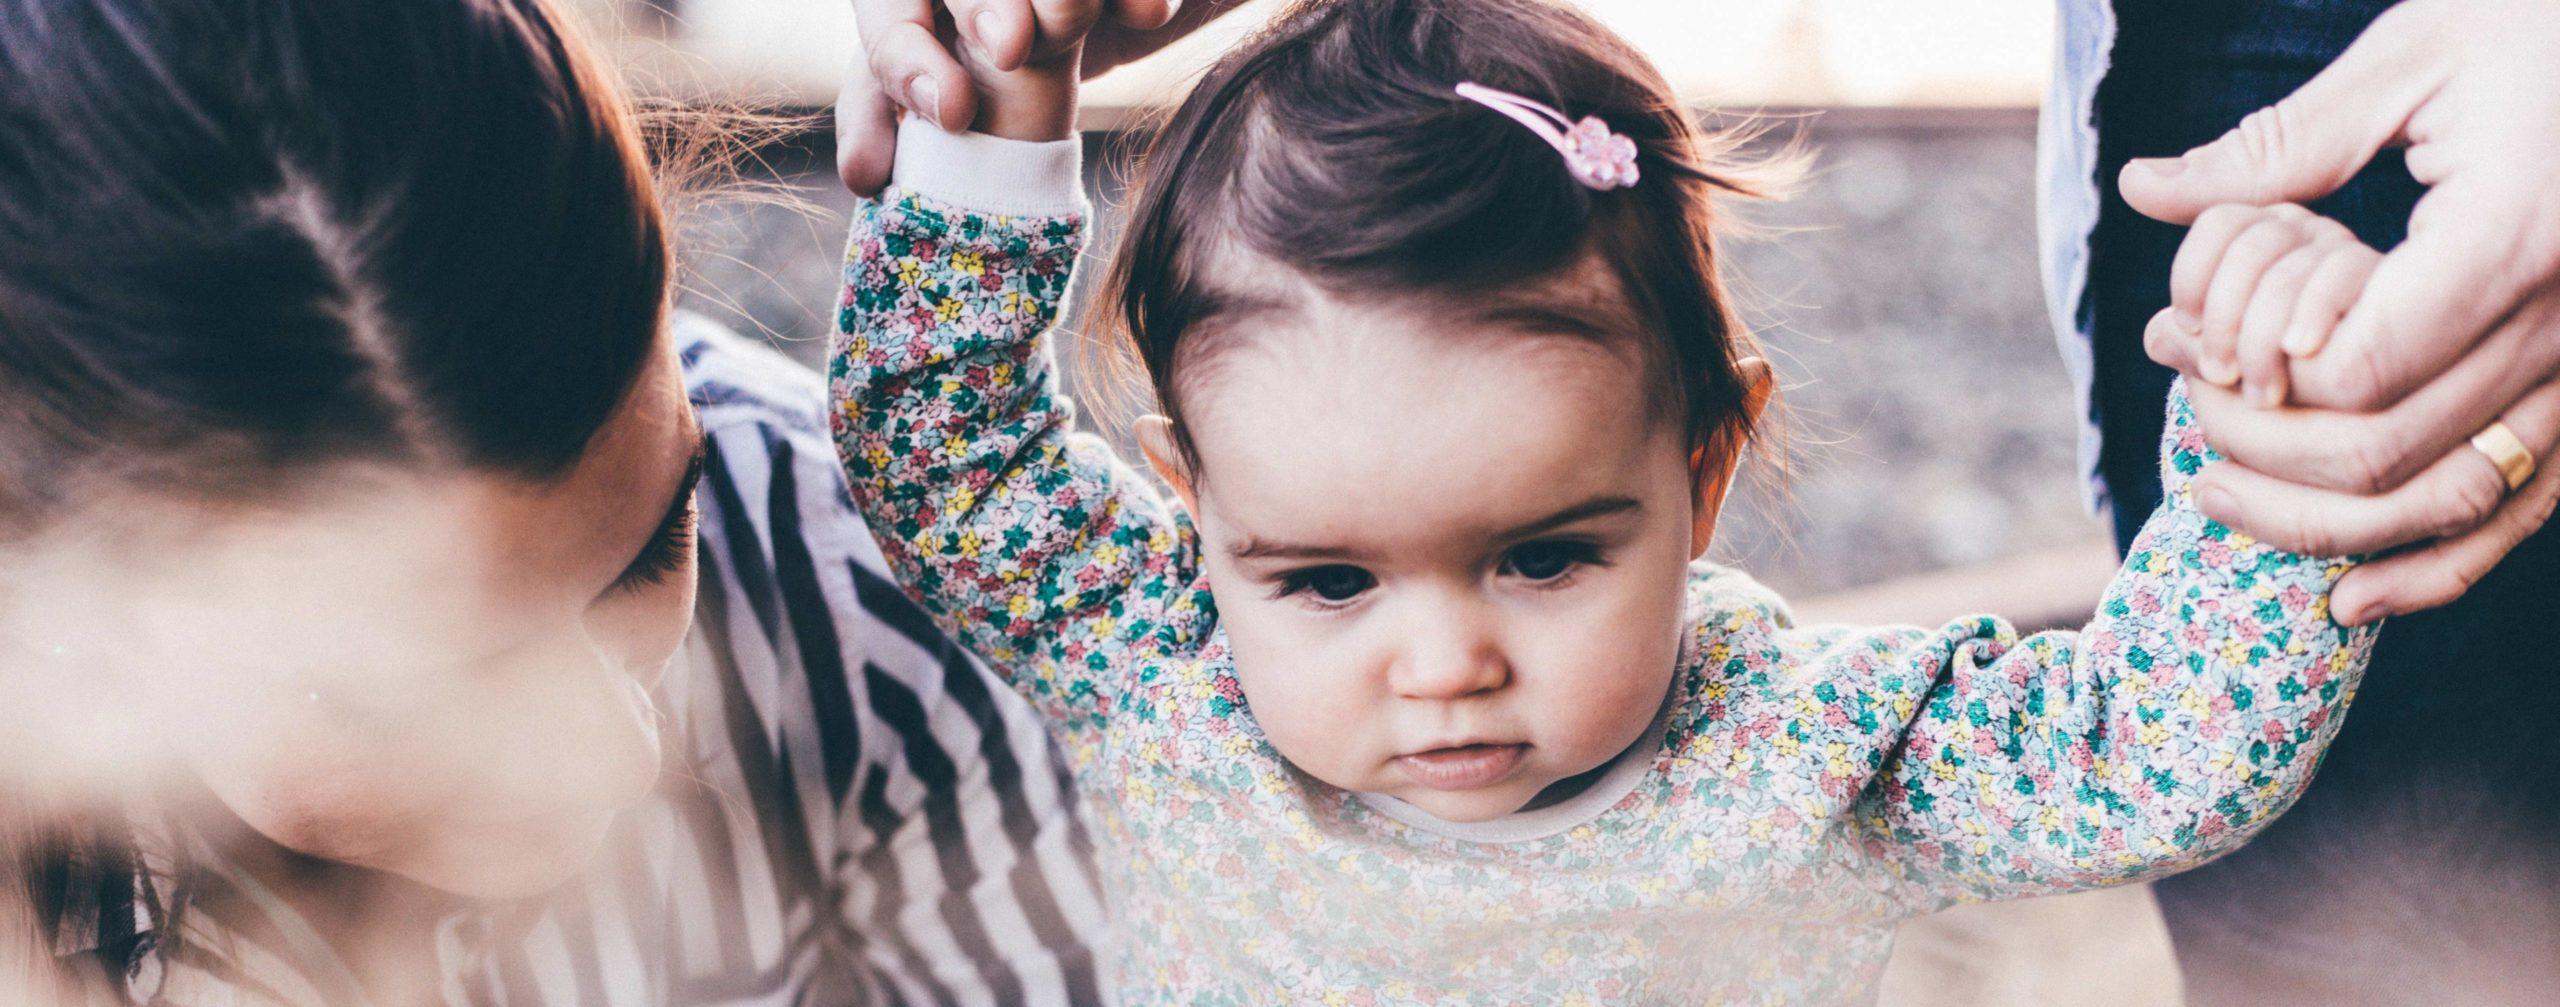 2gen Child Support Services Implementation Guides